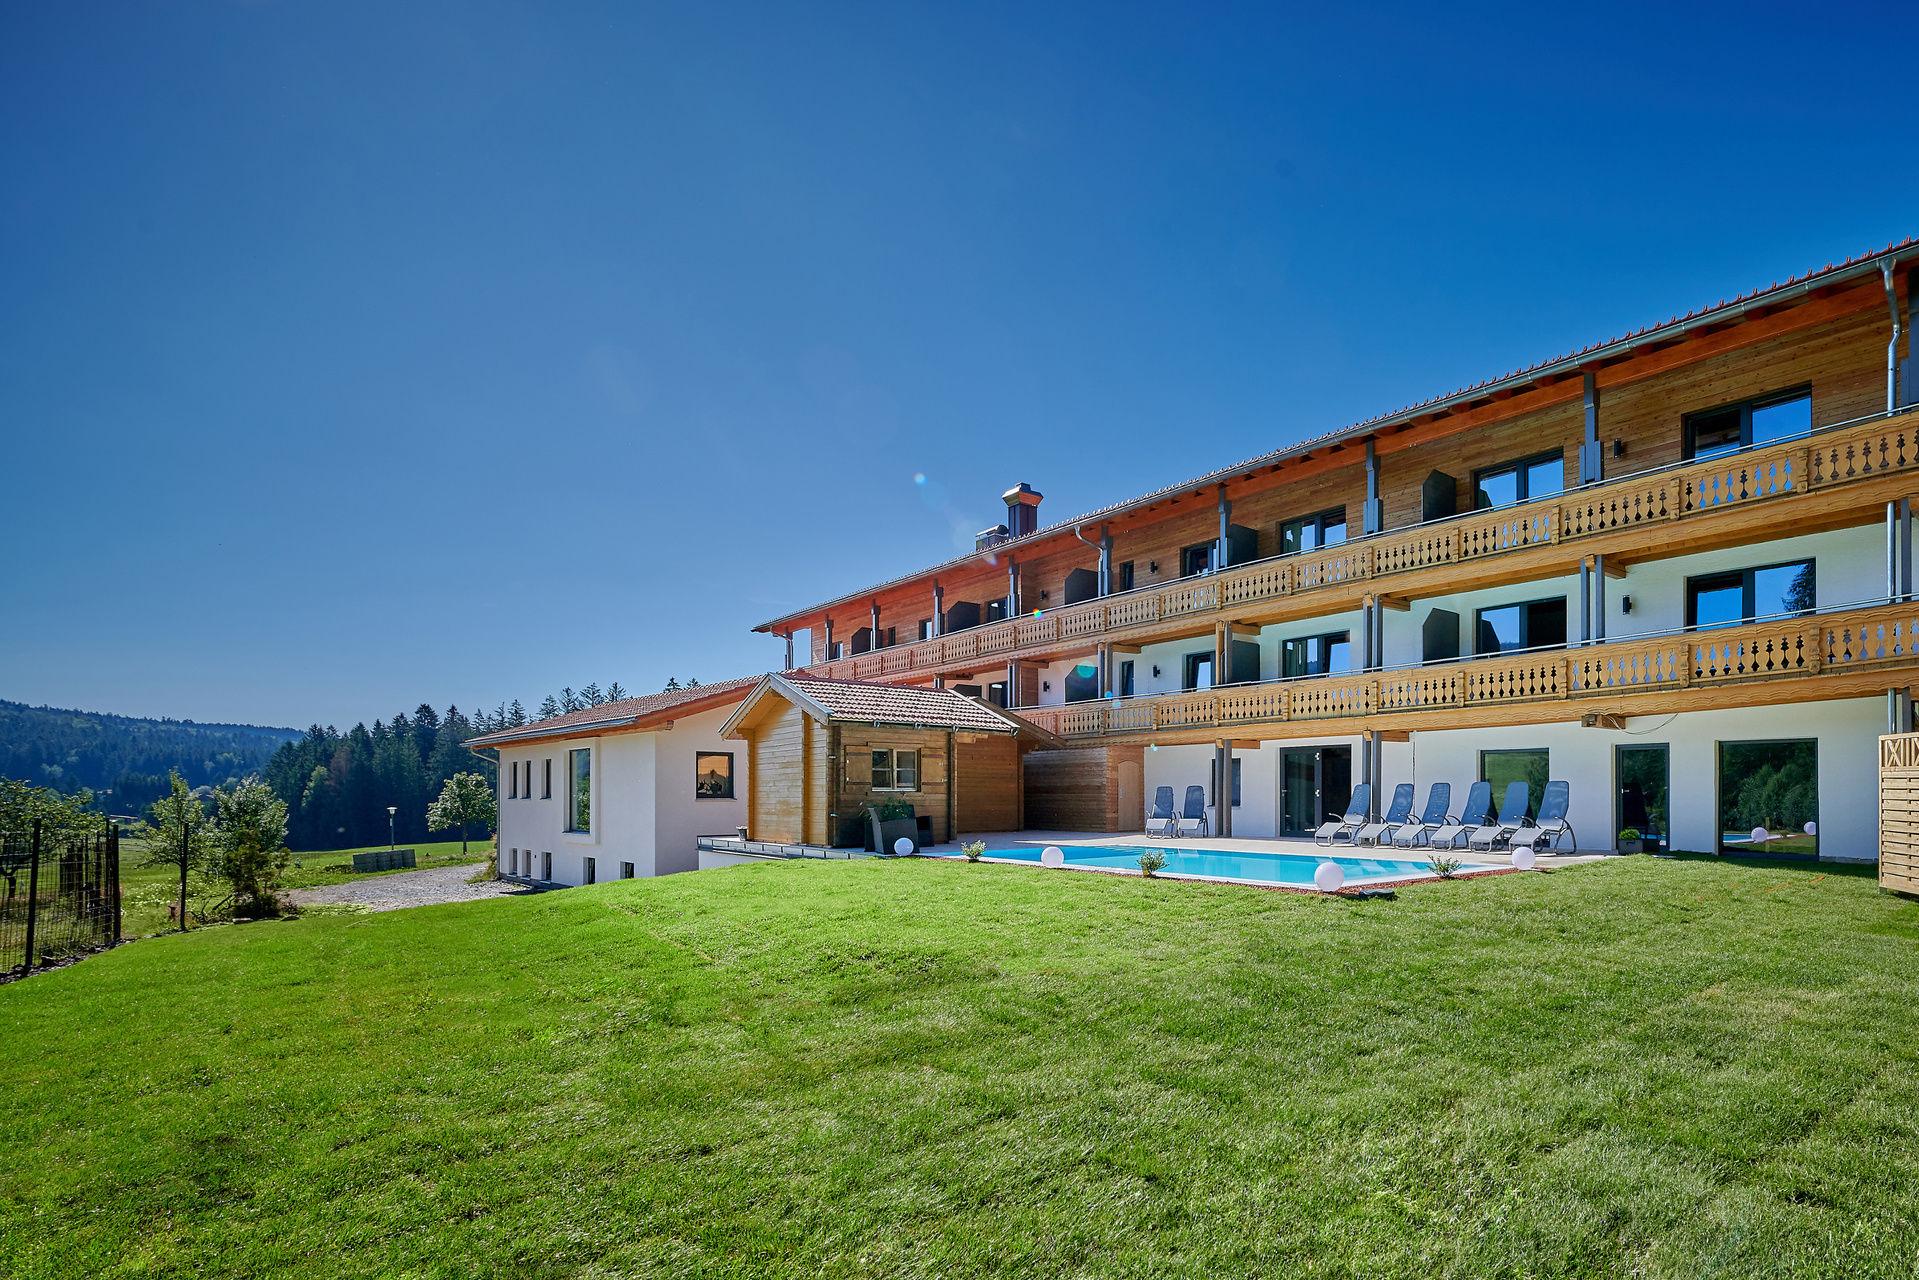 Landhotel Moorhof 3 Sterne Hotel Neuschonau Nationalpark